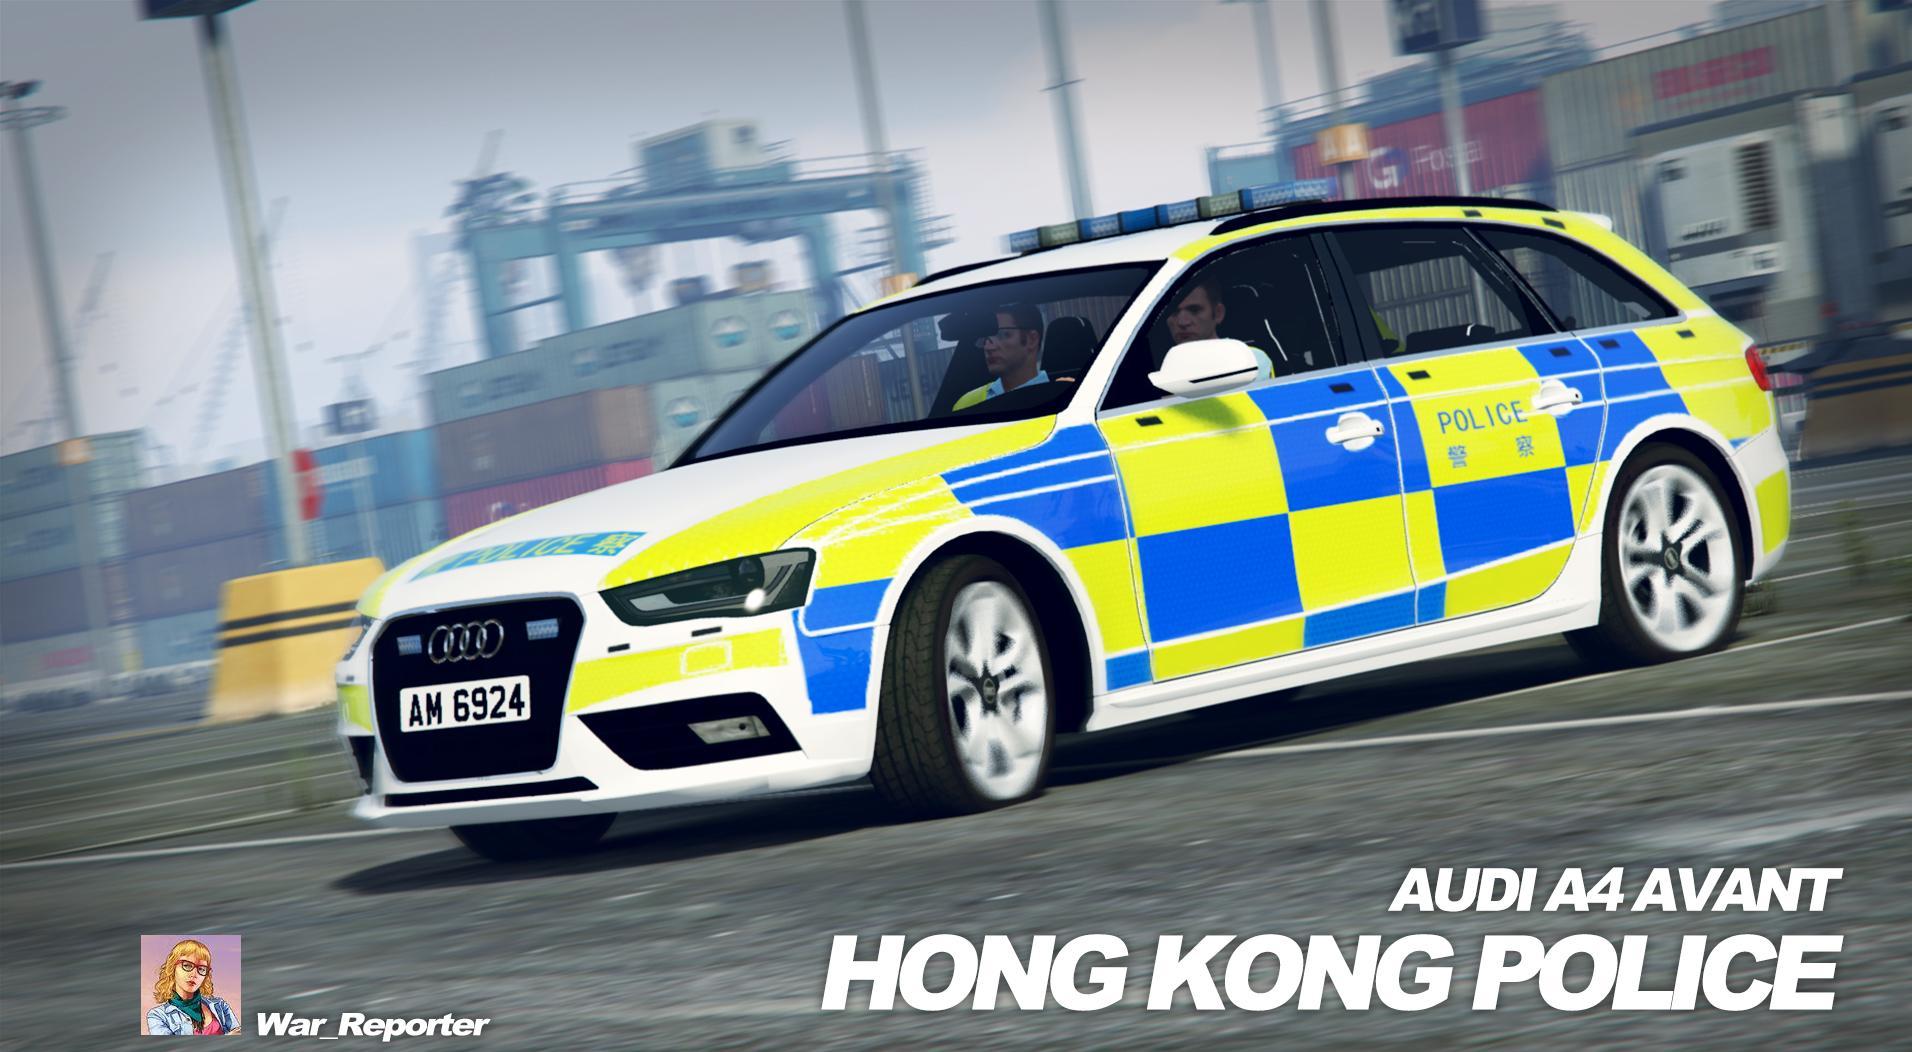 Audi A4 Avant Hong Kong Police Skin Gta5 Mods Com